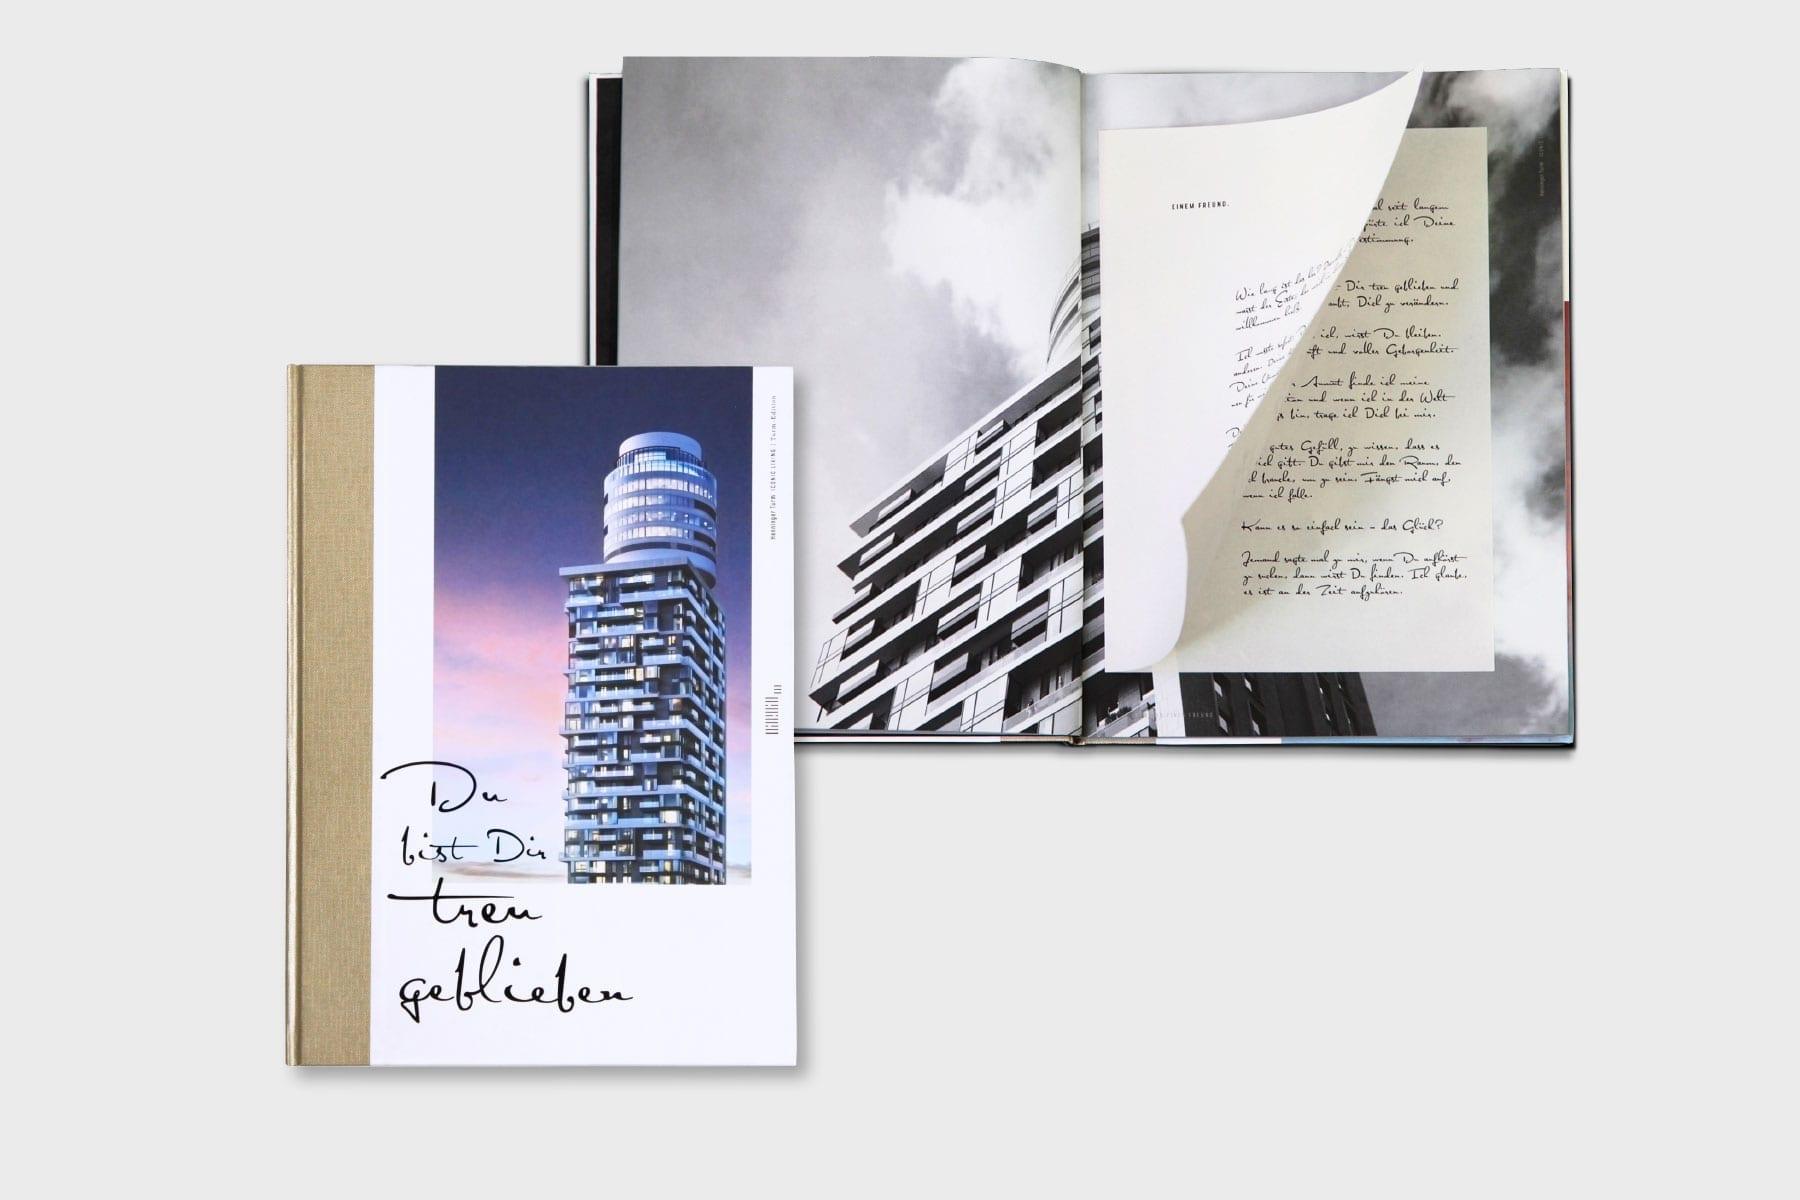 Markenauftritt Wohnturm Henninger Turm Marketing Buch